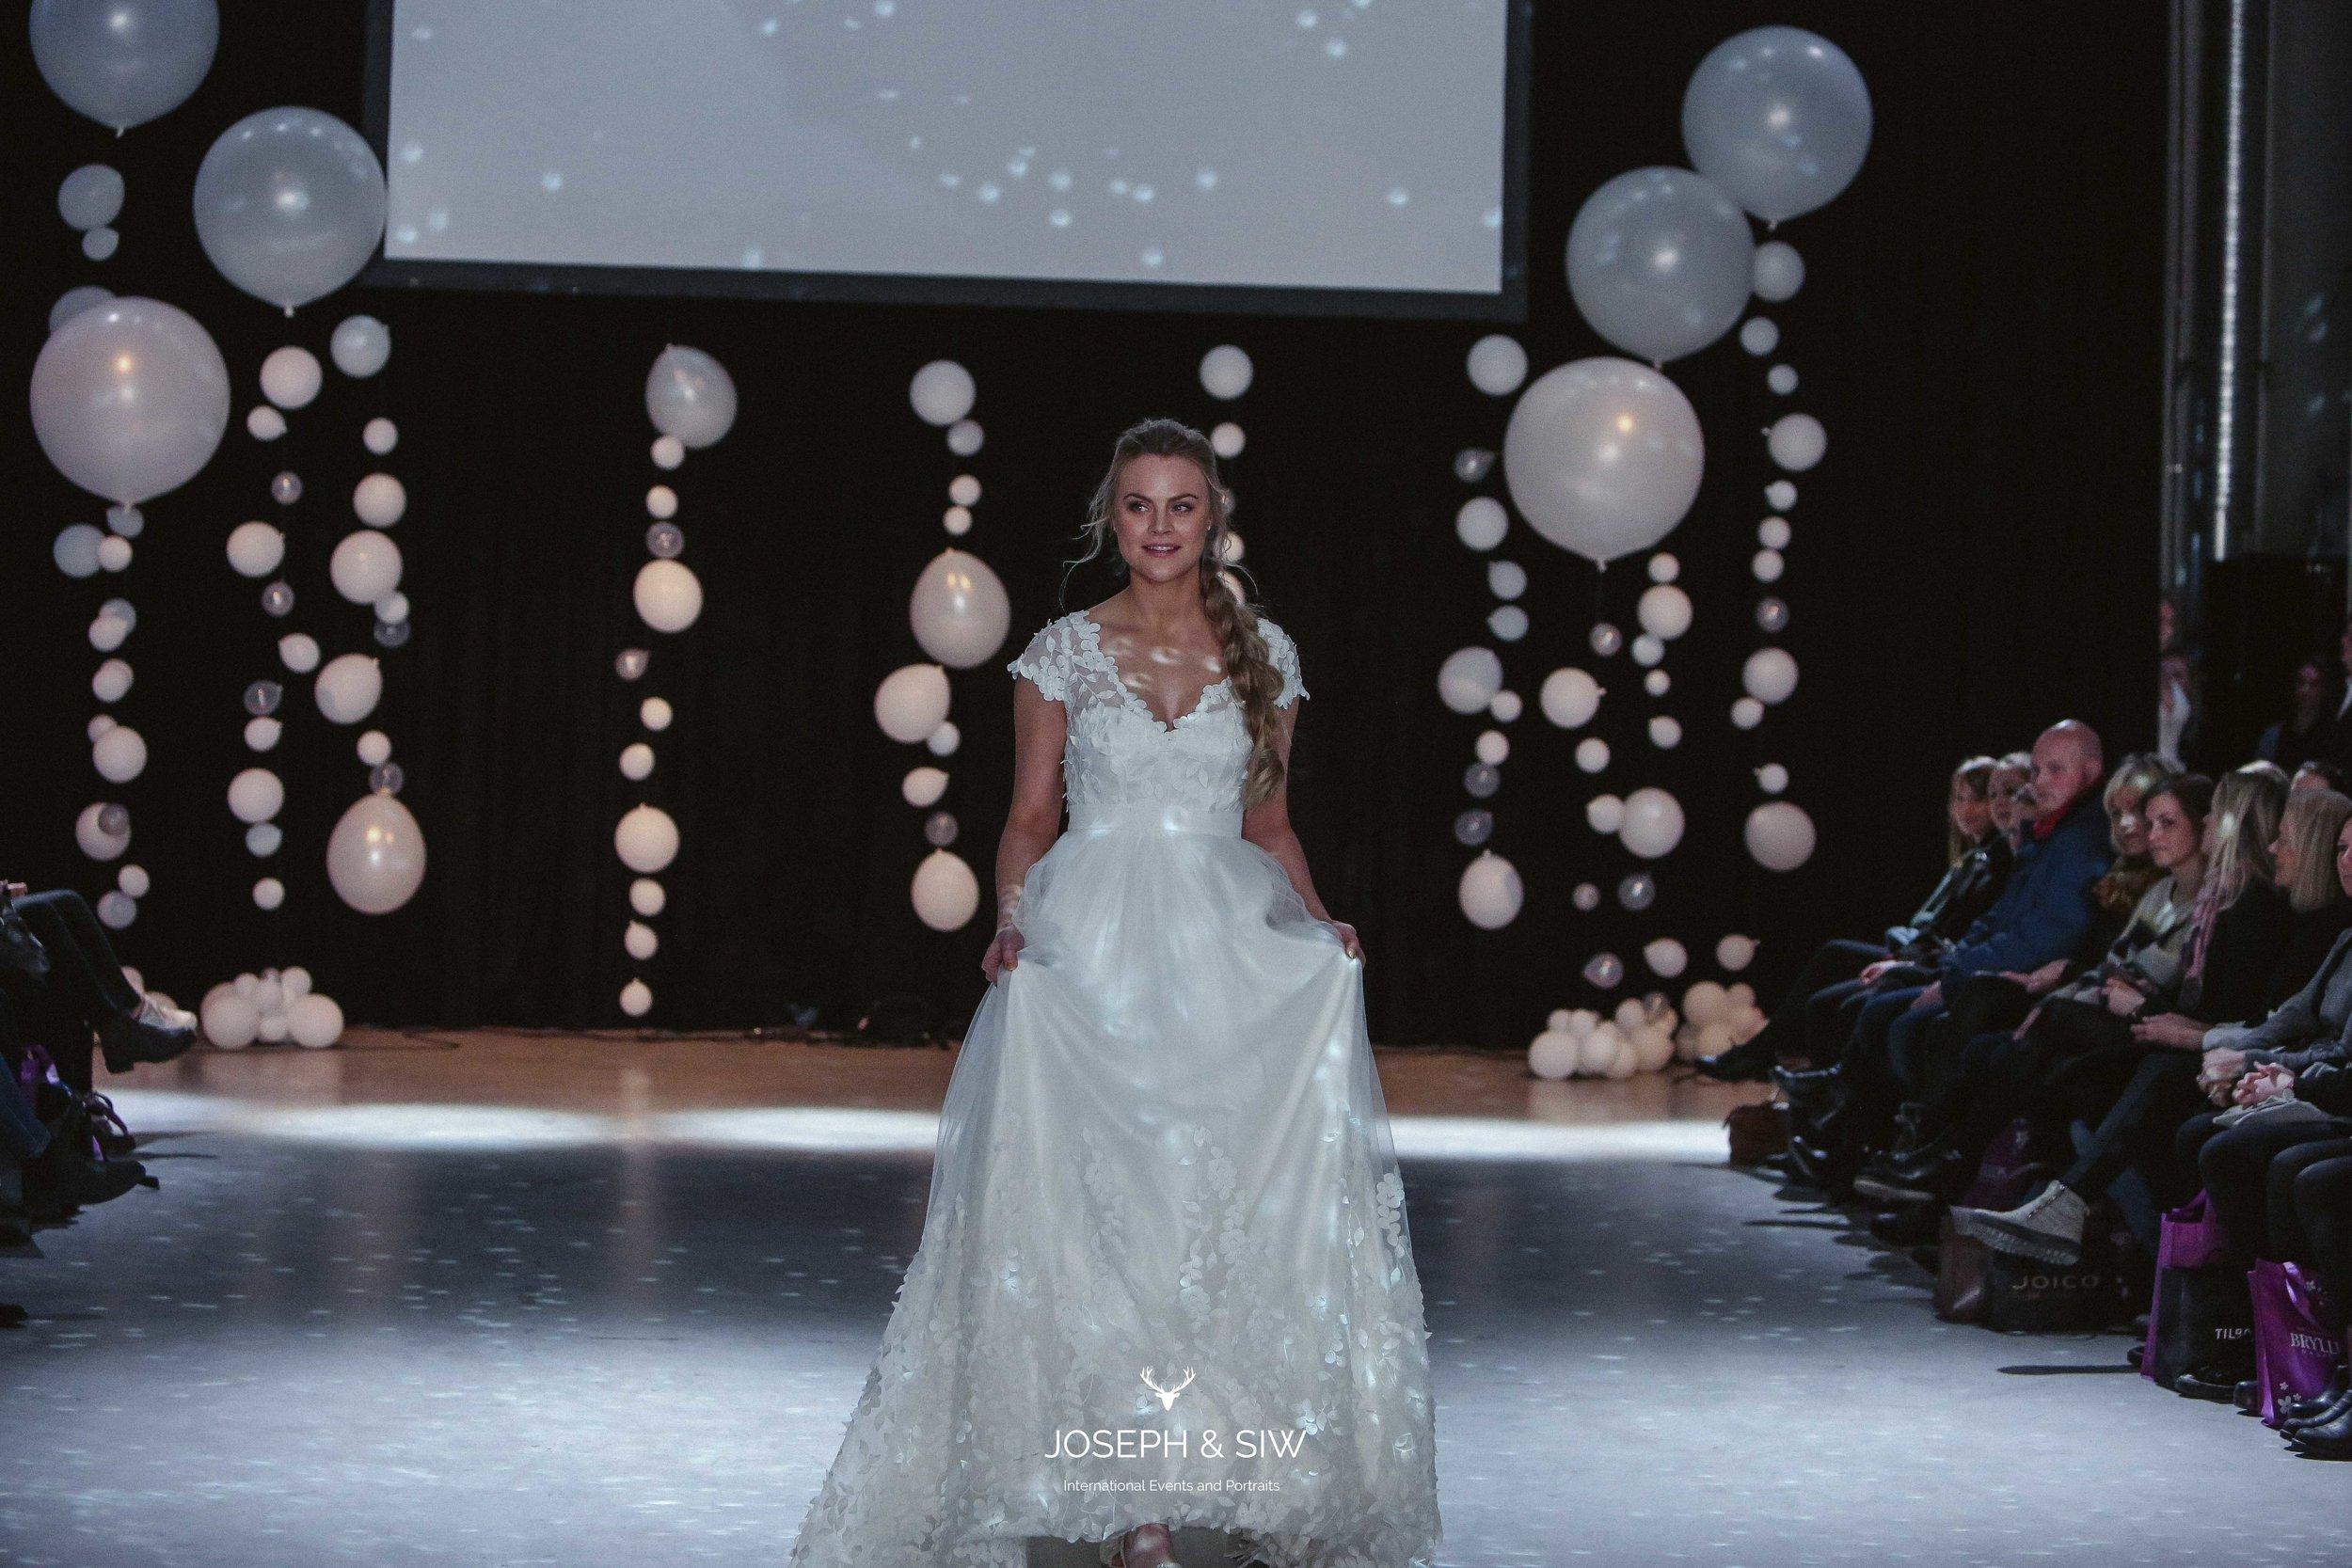 mittbryllup_bryllupsmesse_i_oslo_134.jpg